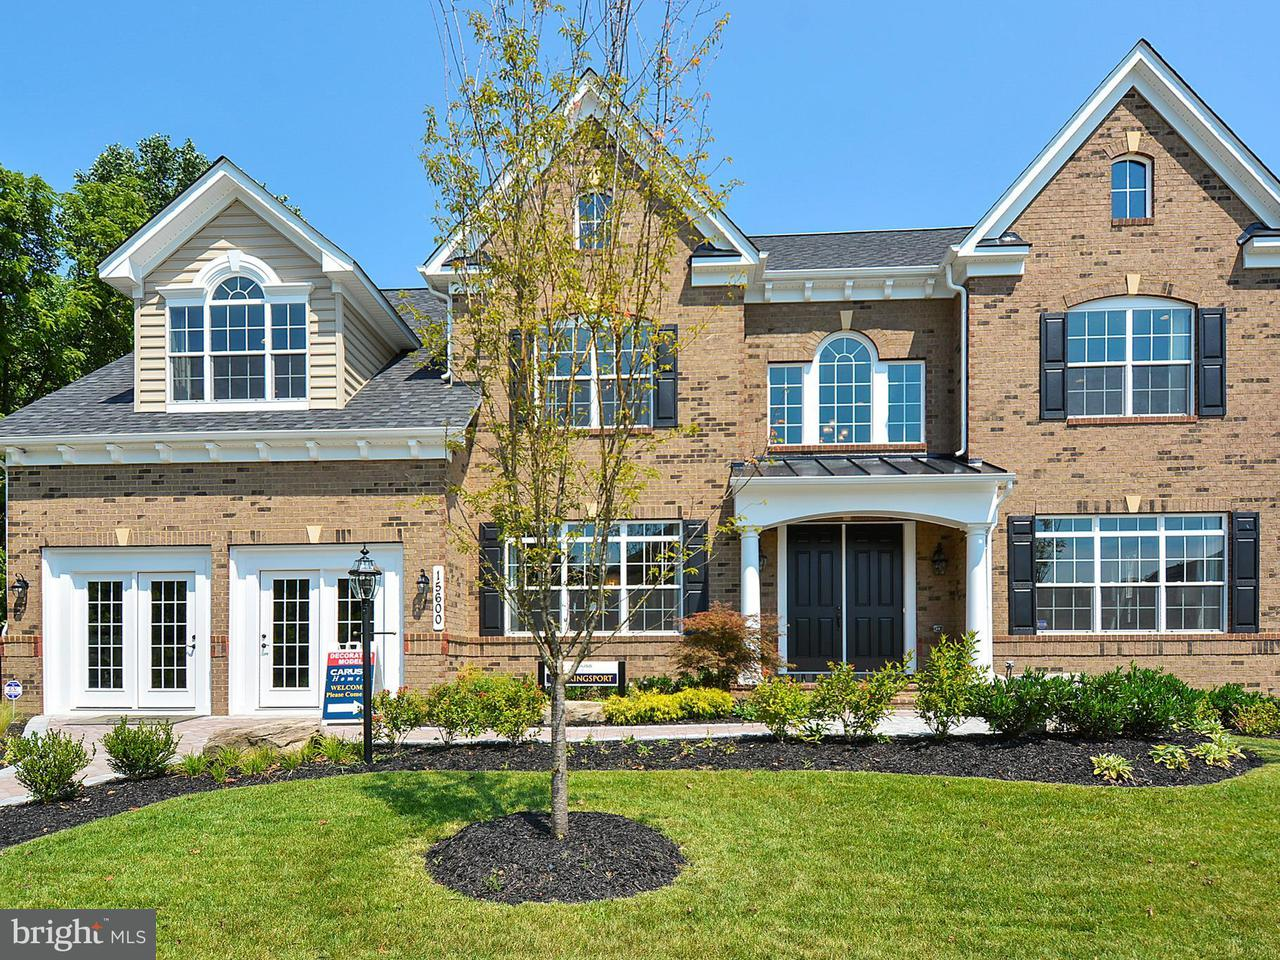 Single Family Home for Sale at 409 LEGACY Lane 409 LEGACY Lane Severna Park, Maryland 21146 United States